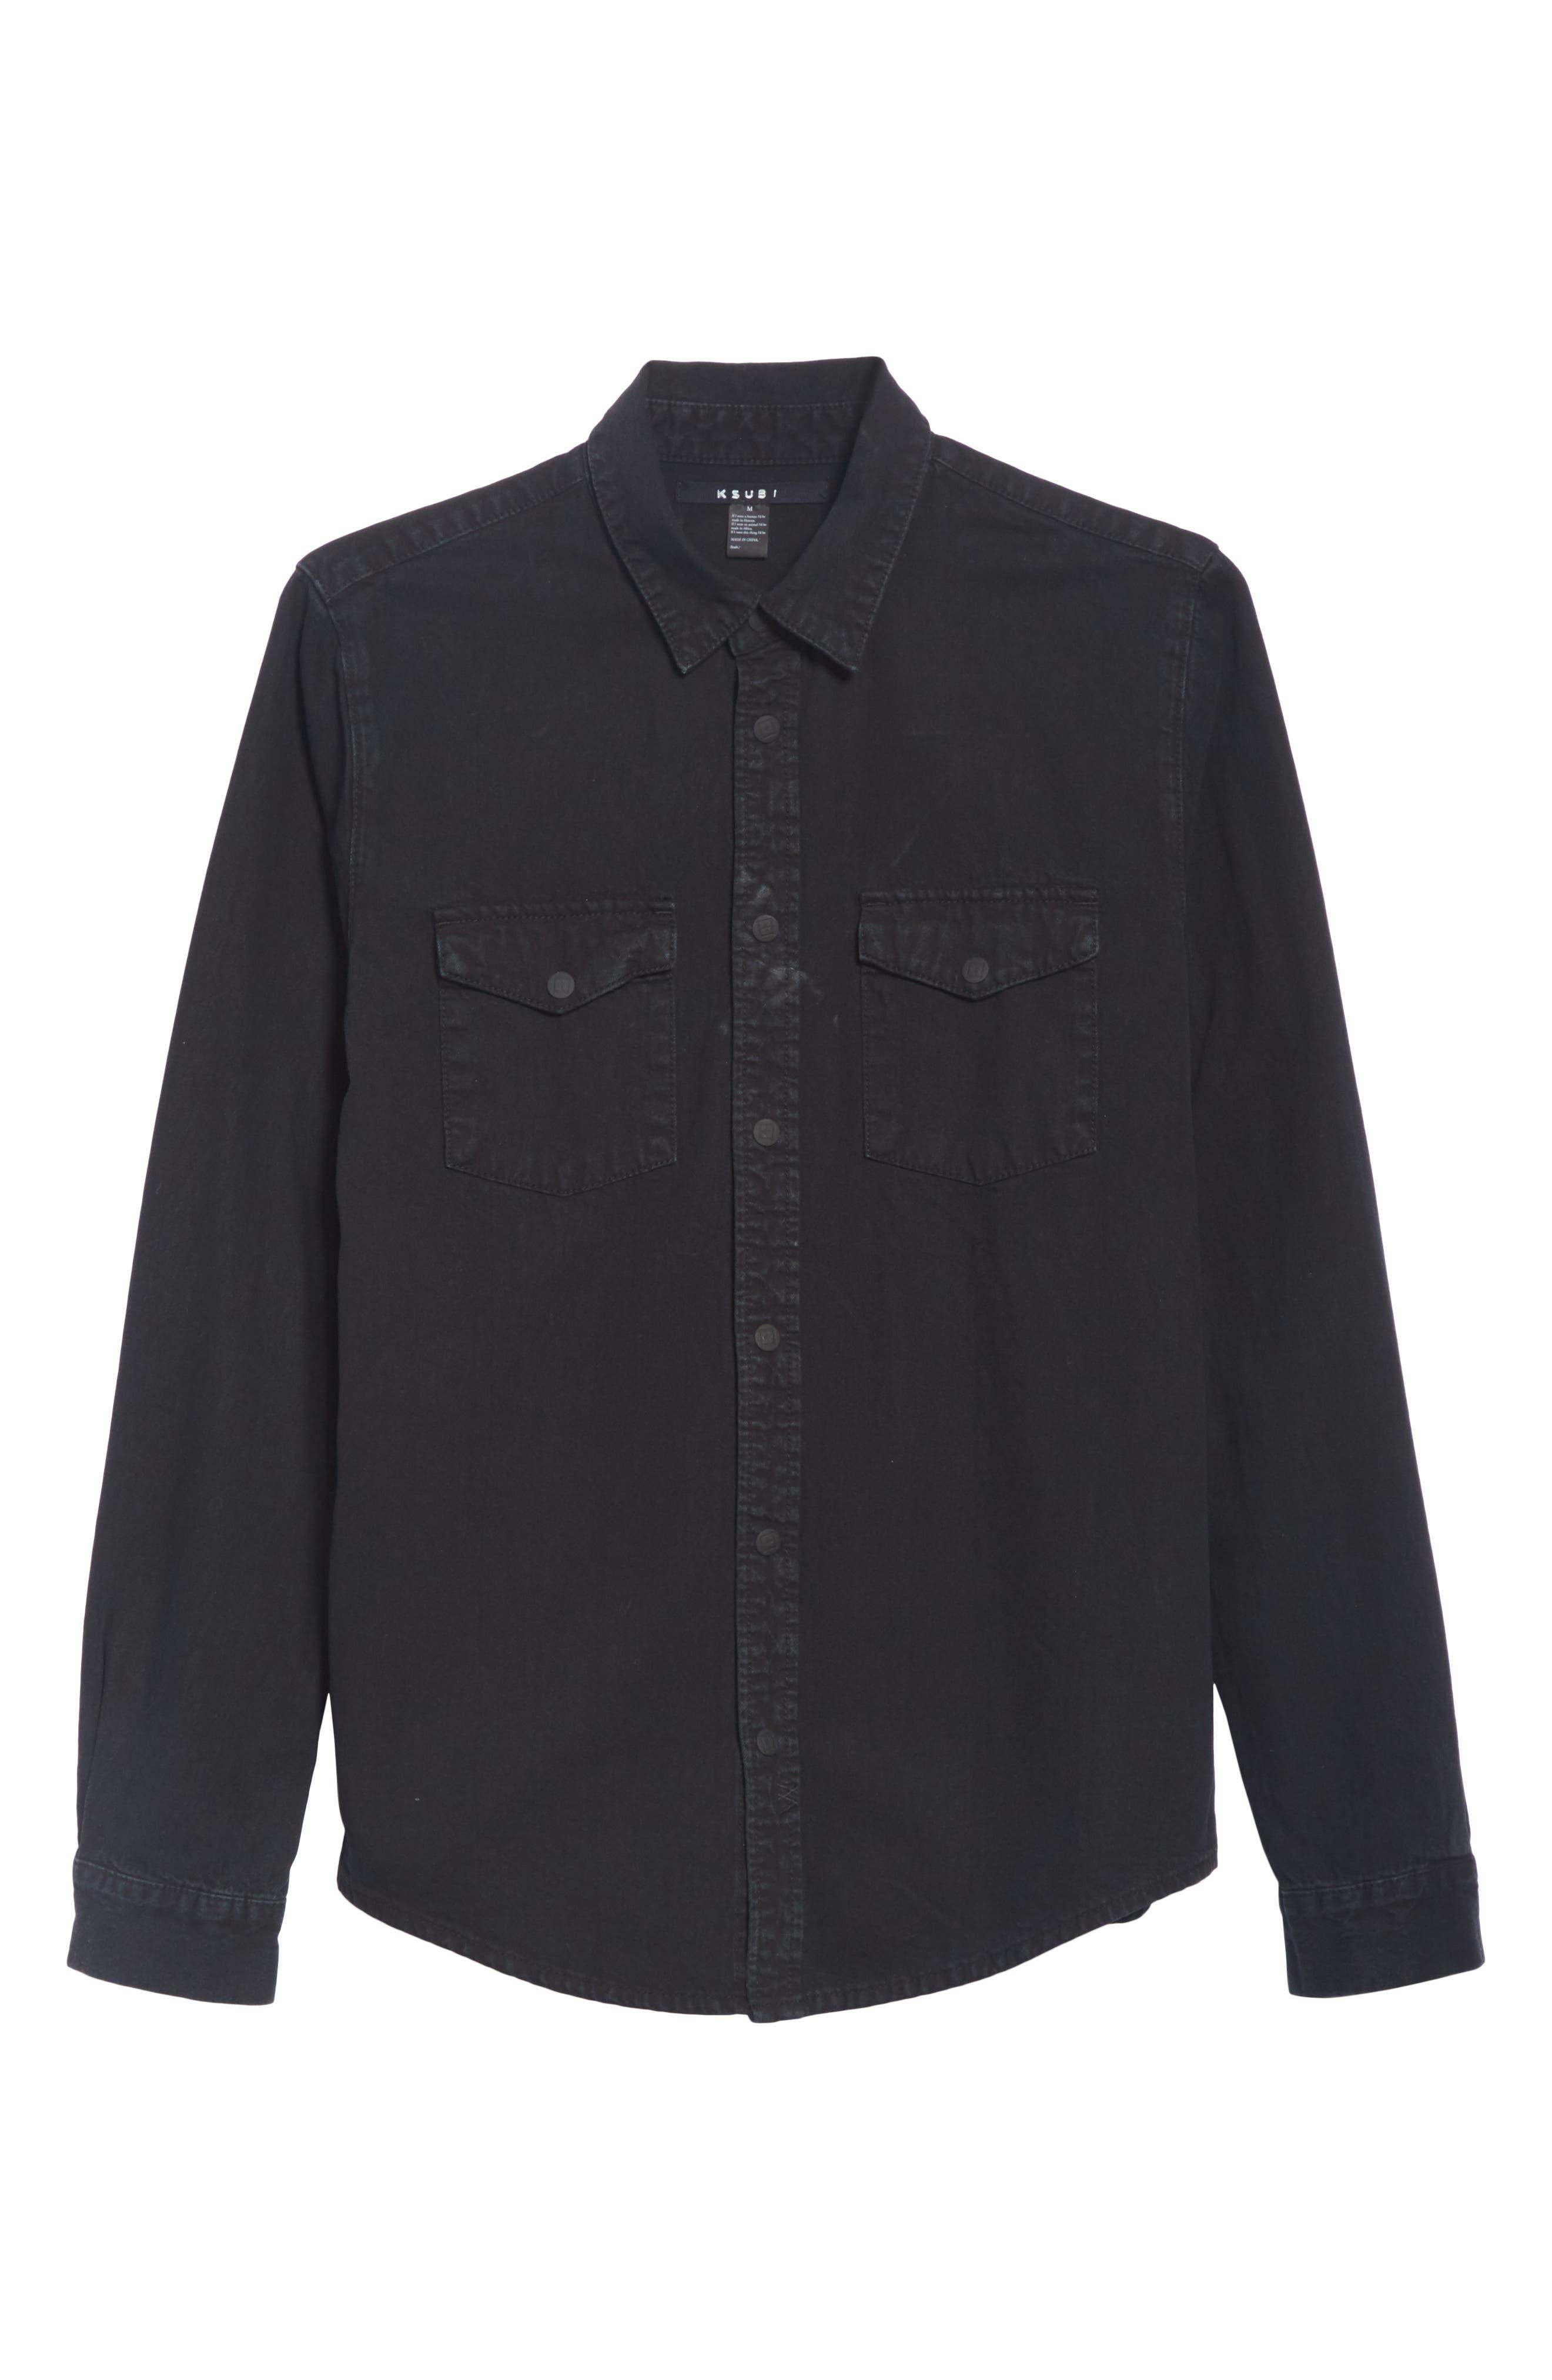 Frontier Work Shirt,                             Alternate thumbnail 6, color,                             BLACK